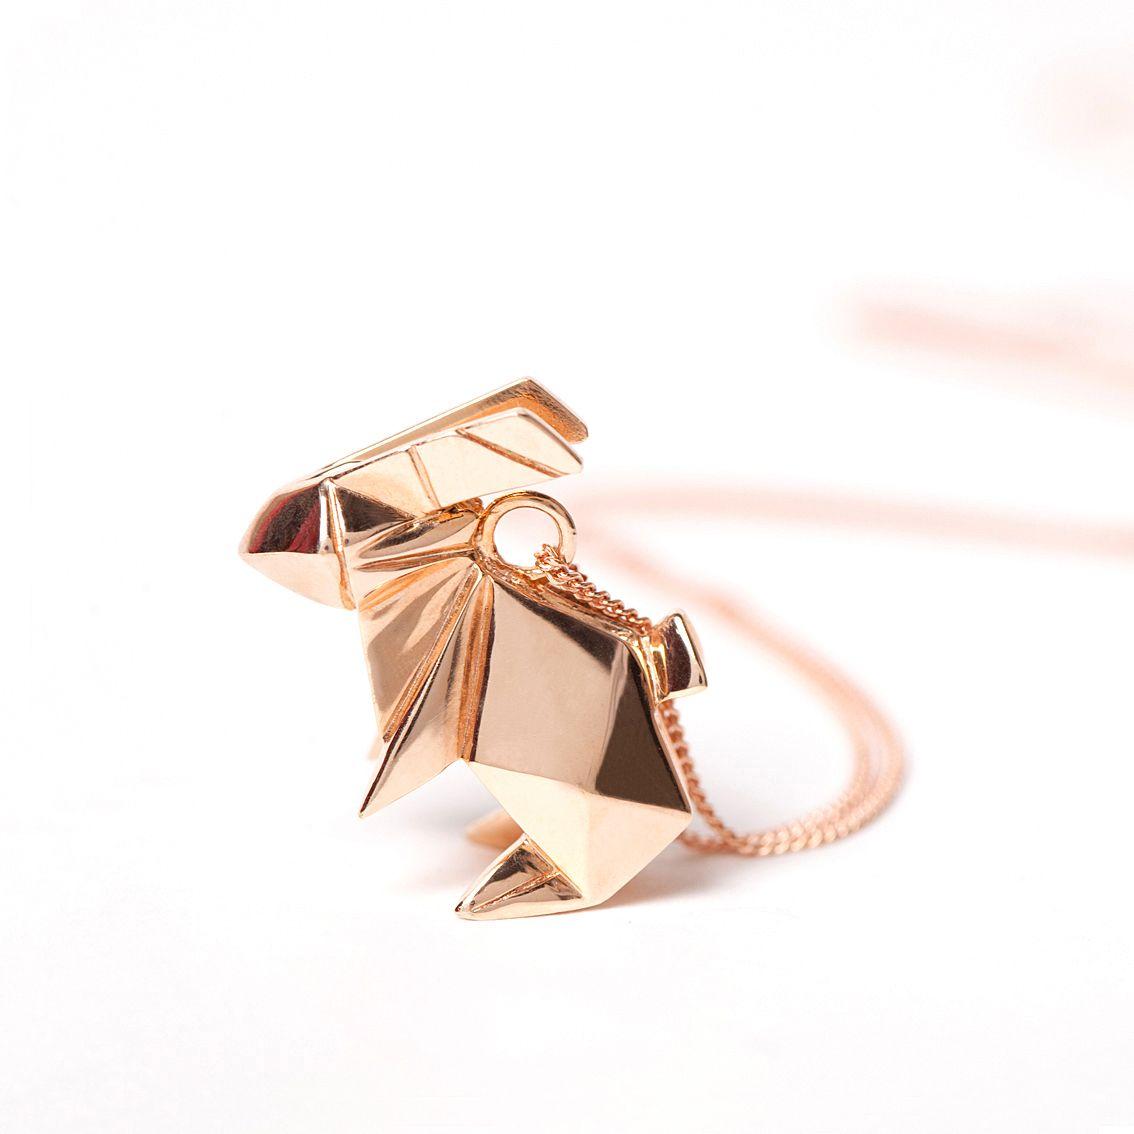 | origami jewellery | | Accesorios. | Pinterest | Joyas ... - photo#26